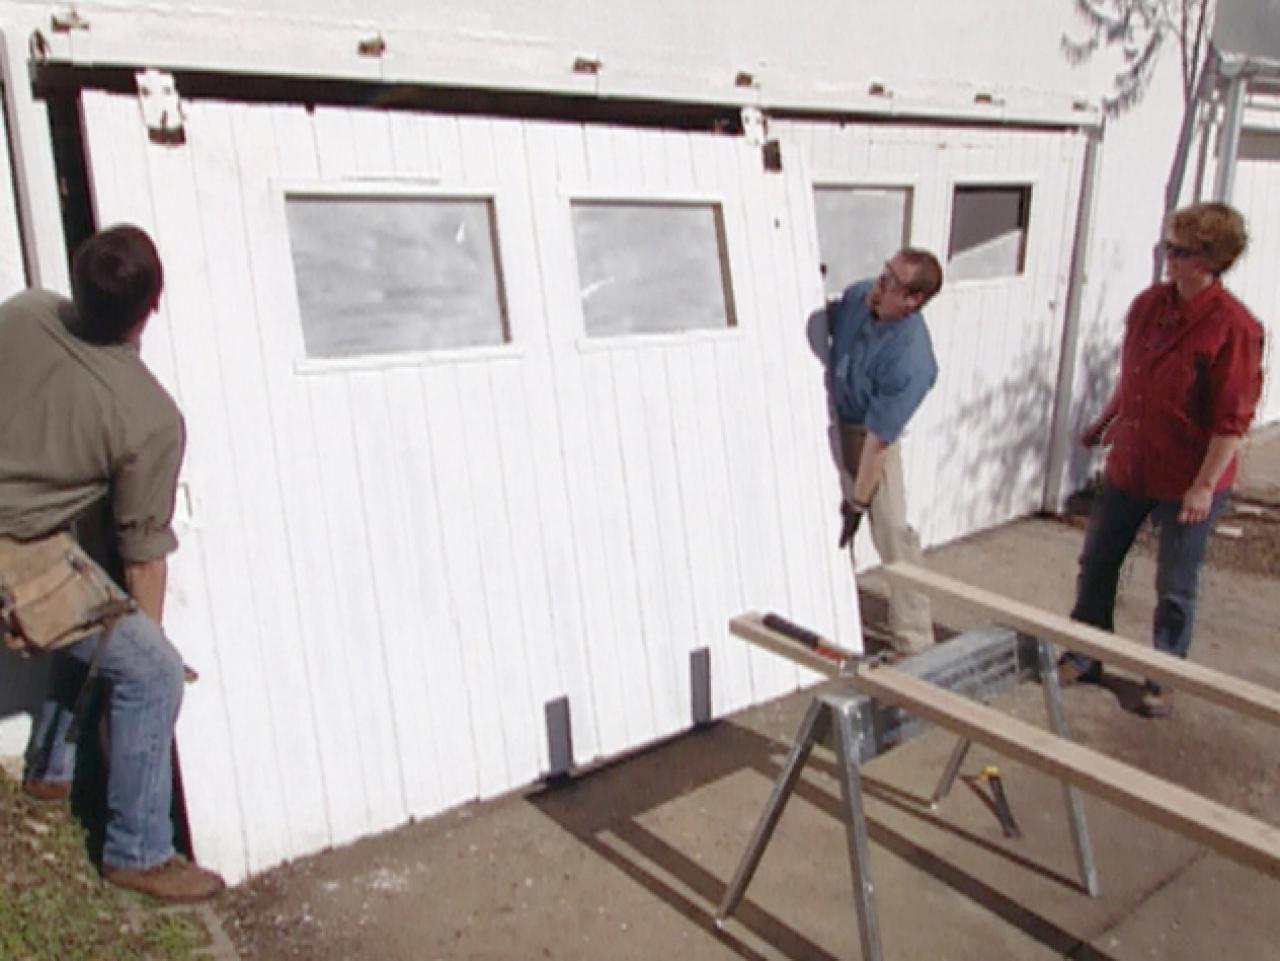 Restoring Vintage Sliding Garage Doors Sliding Garage Doors Sliding Barn Door Hardware Used Garage Doors